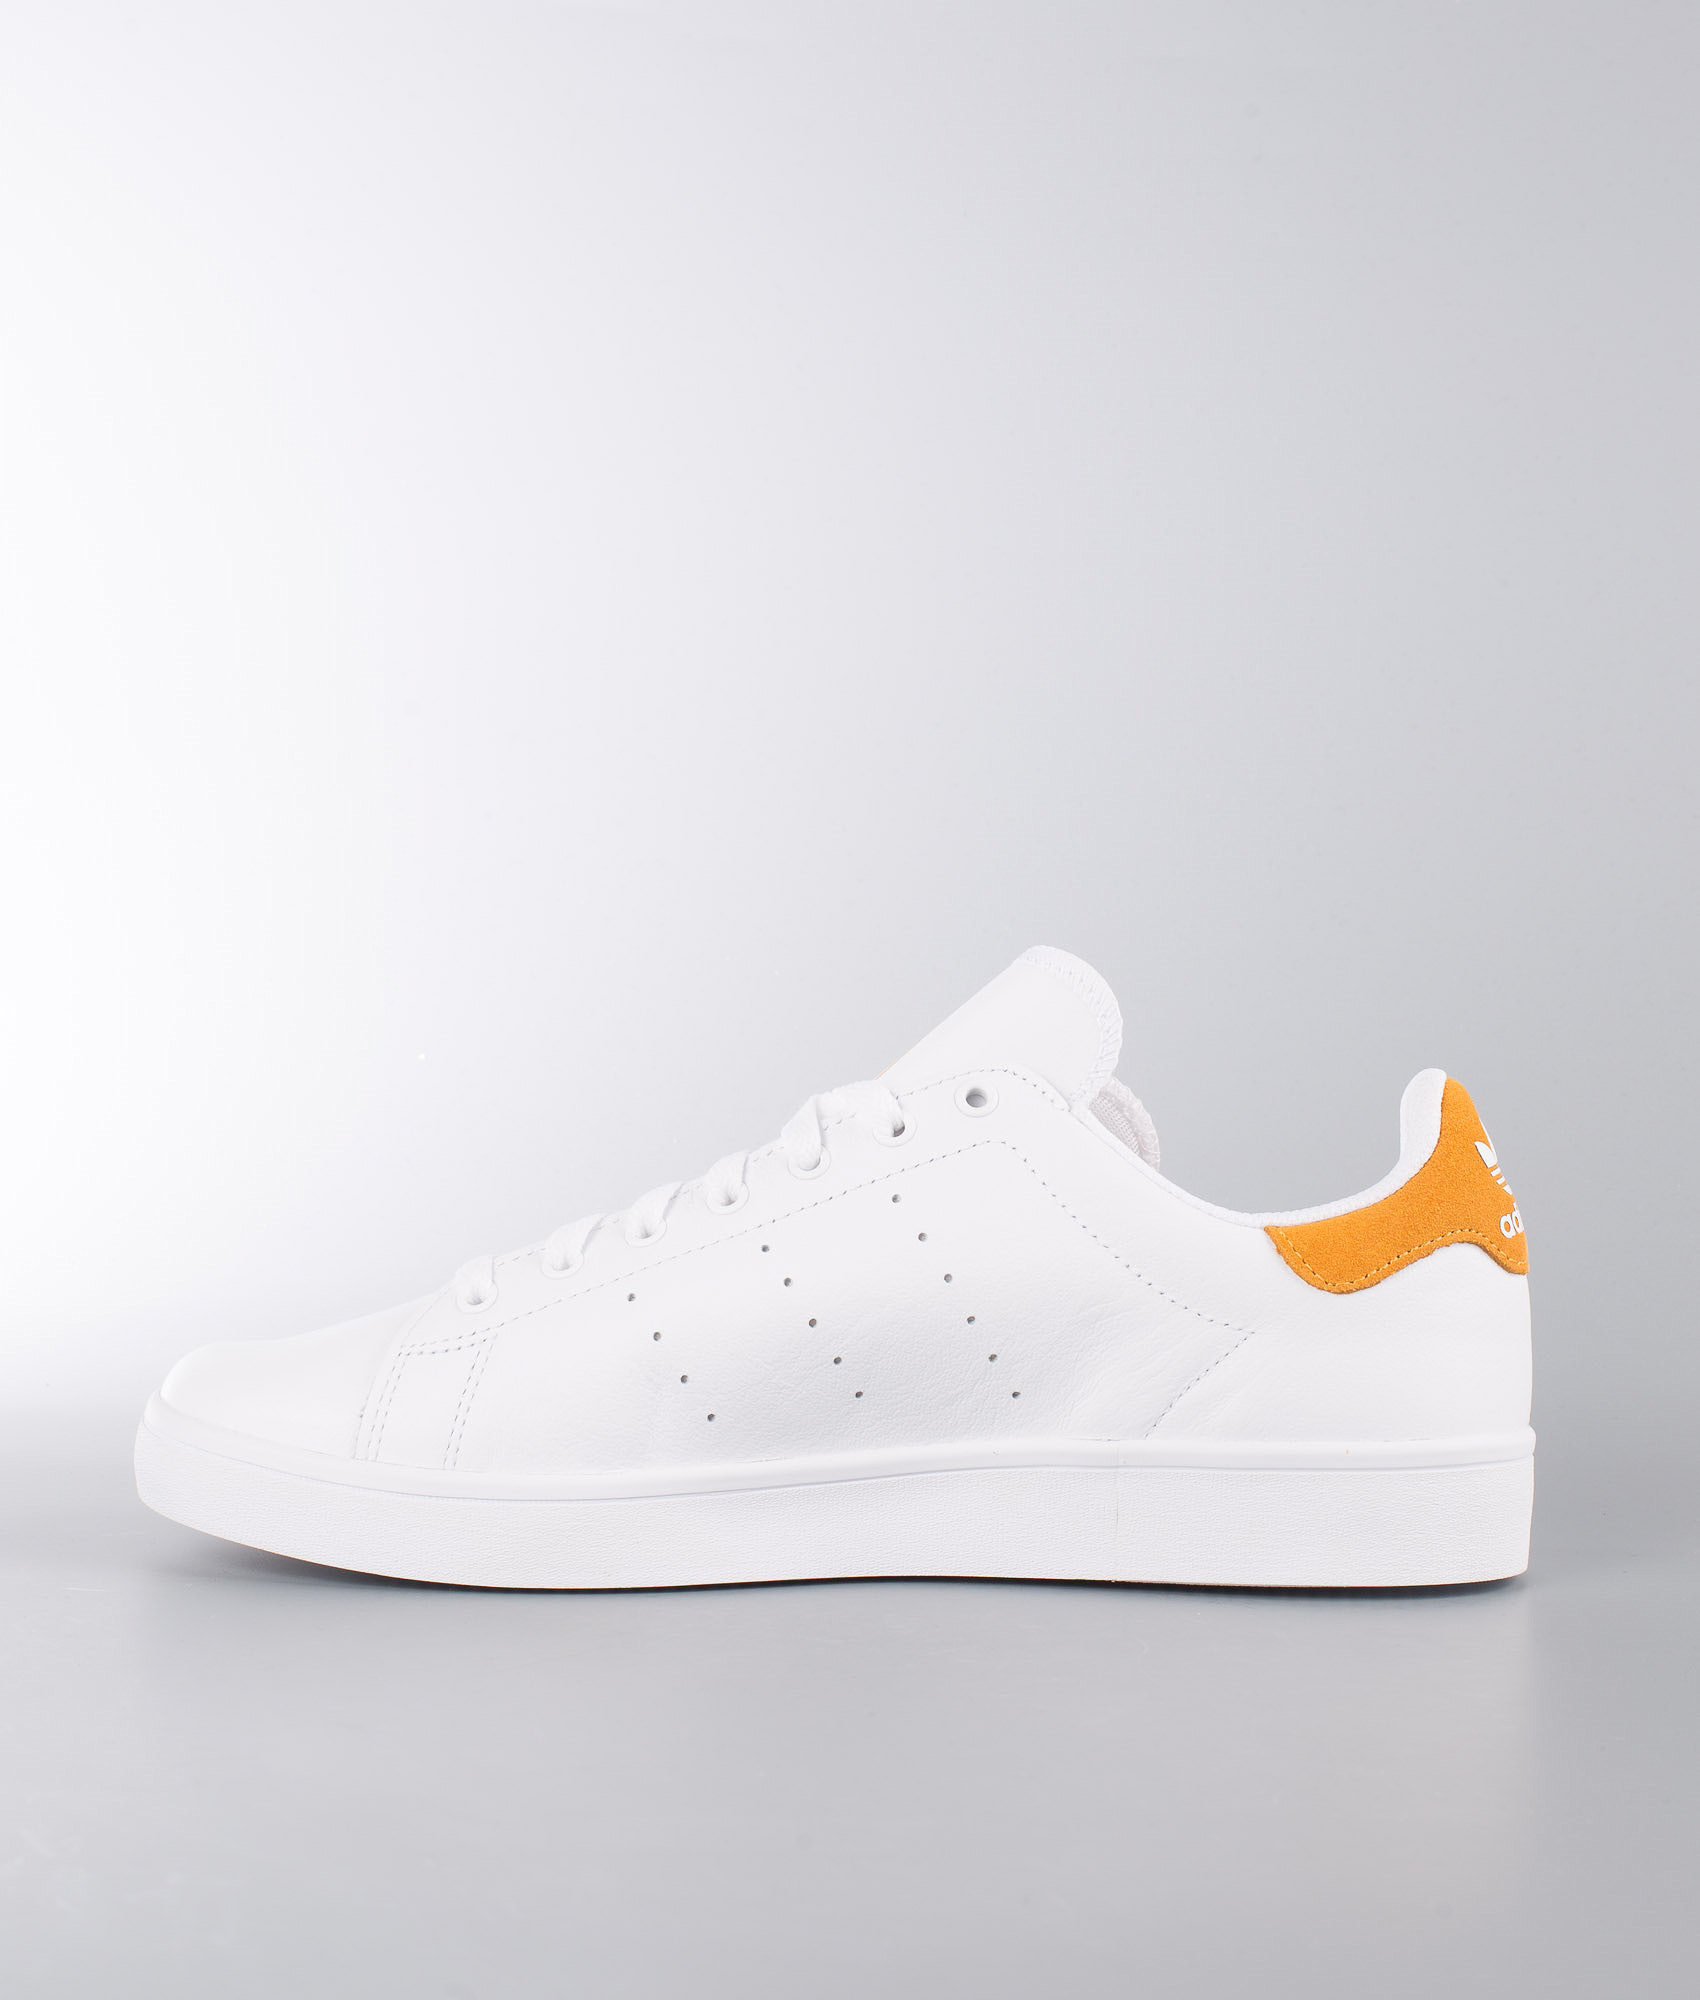 Adidas Skateboarding Stan Smith Vulc Shoes Ftwr White Ftwr White ... 23626bd780